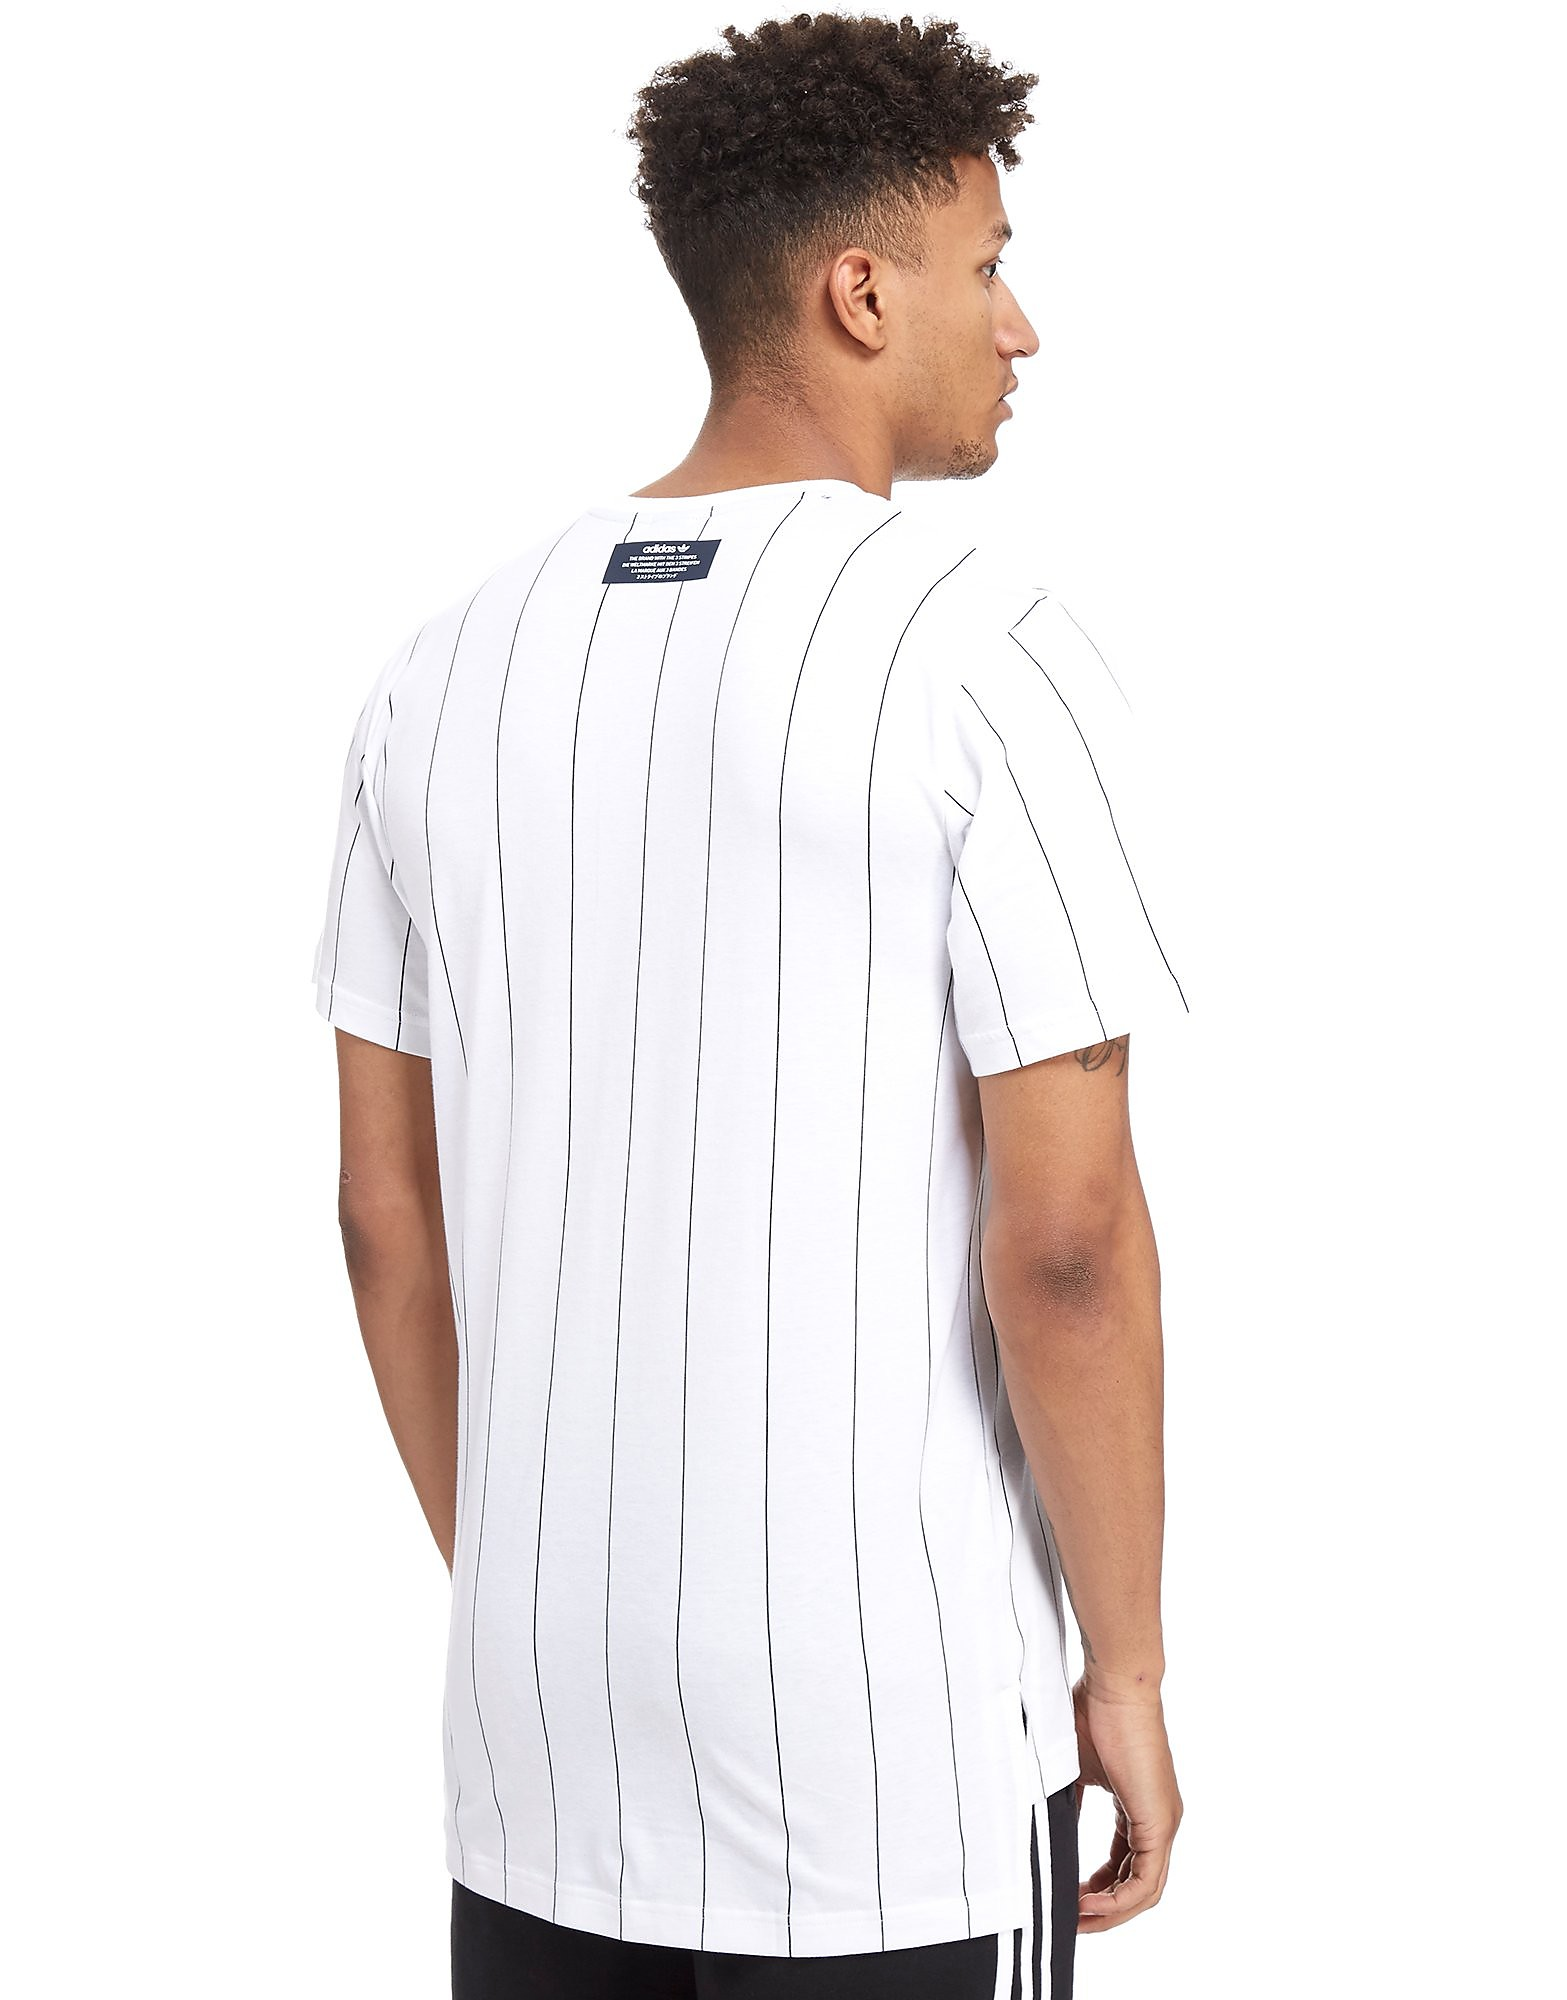 adidas Originals Tokyo Street T-shirt